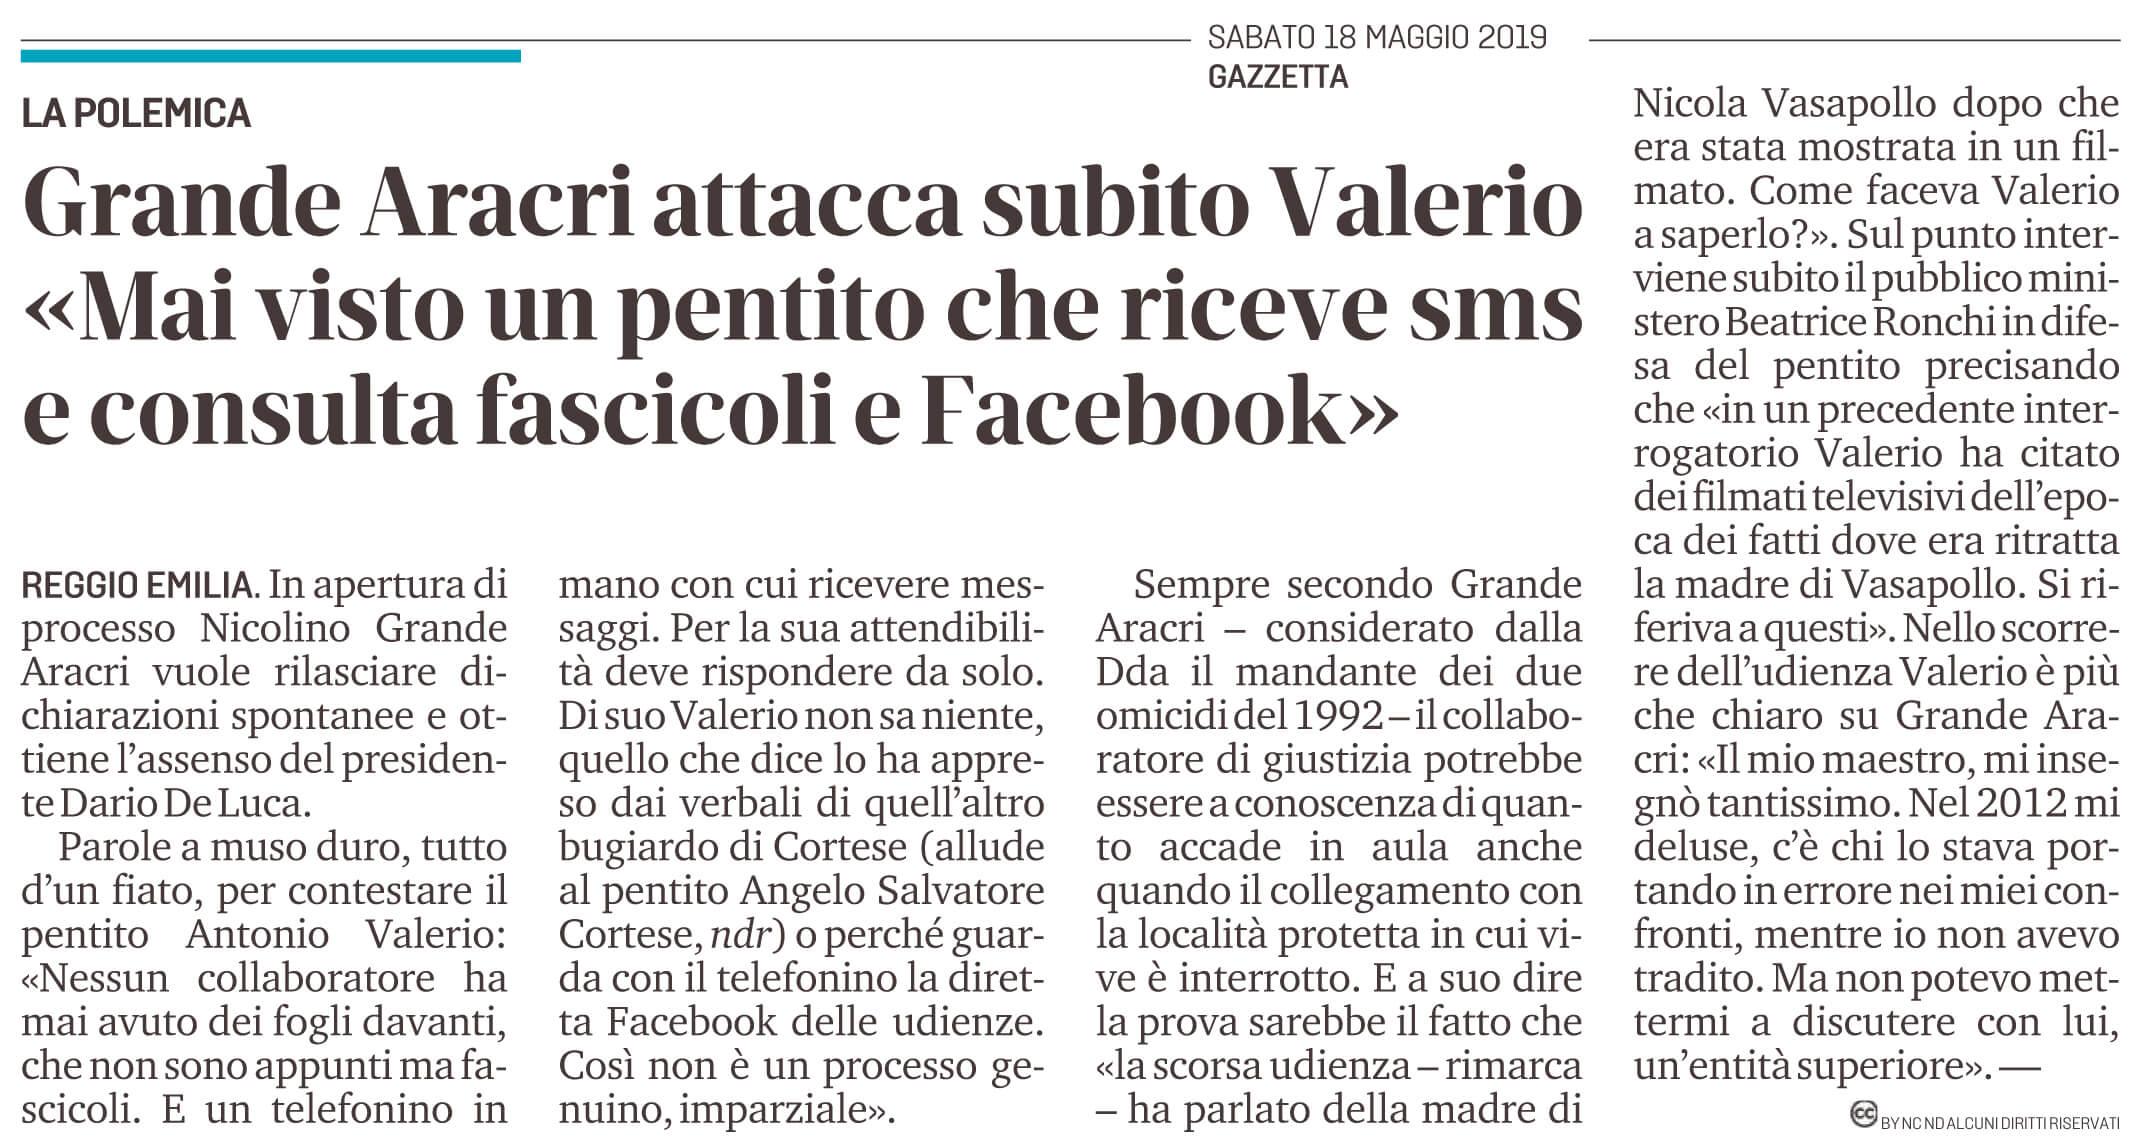 Fascicoli & Facebook